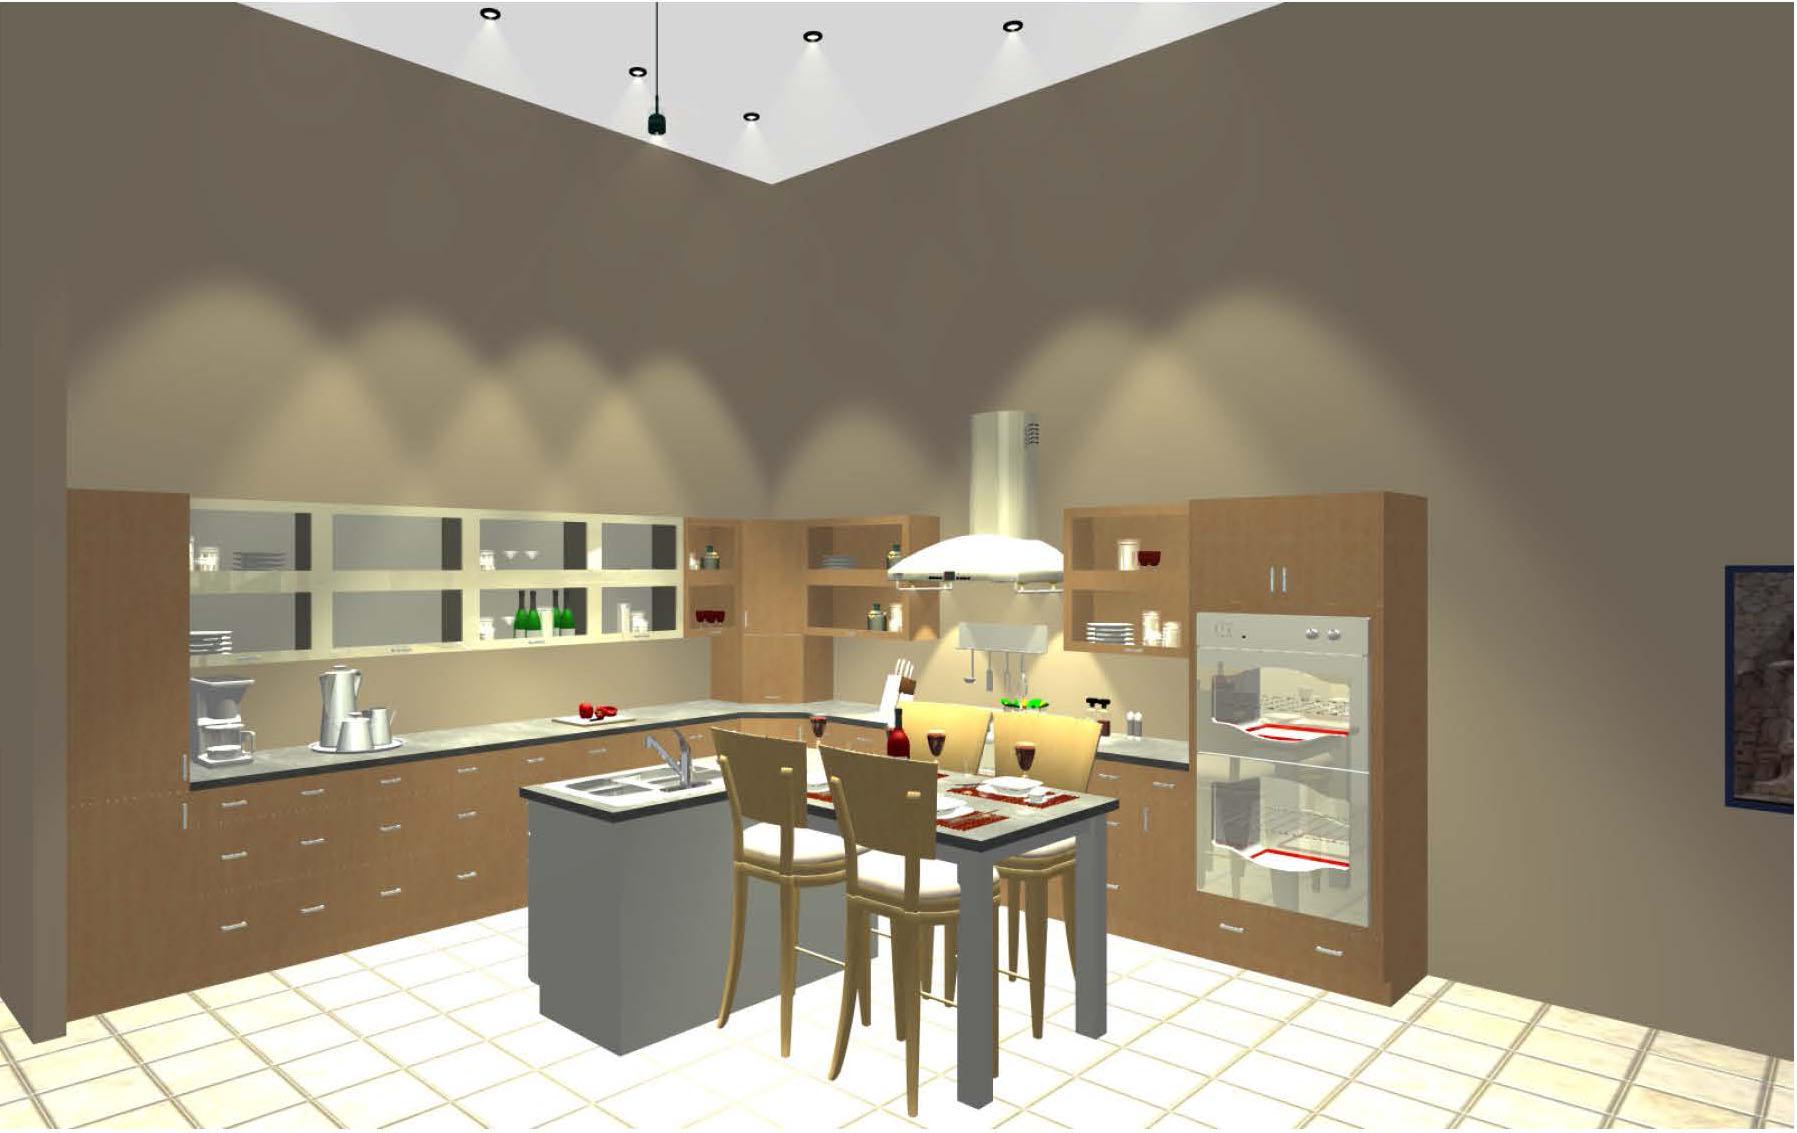 Rendering of Contemporary Kitchen in Devon, PA